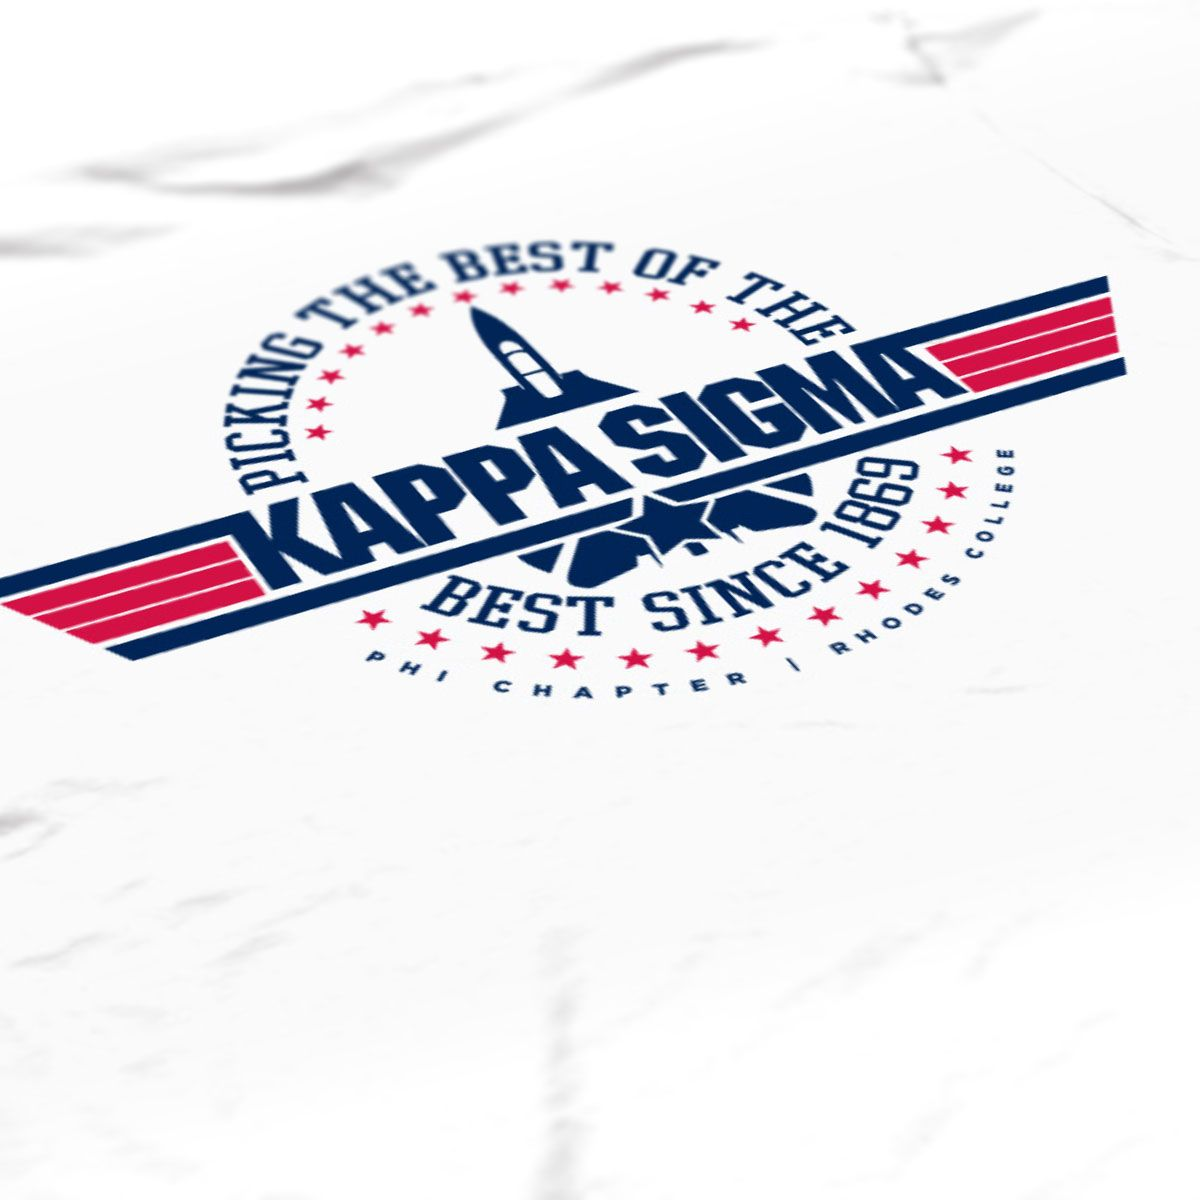 Shirt ke design - Kappa Sigma Ke Kappa Sig Rush Kappa Sigma Design Fraternity Tshirts